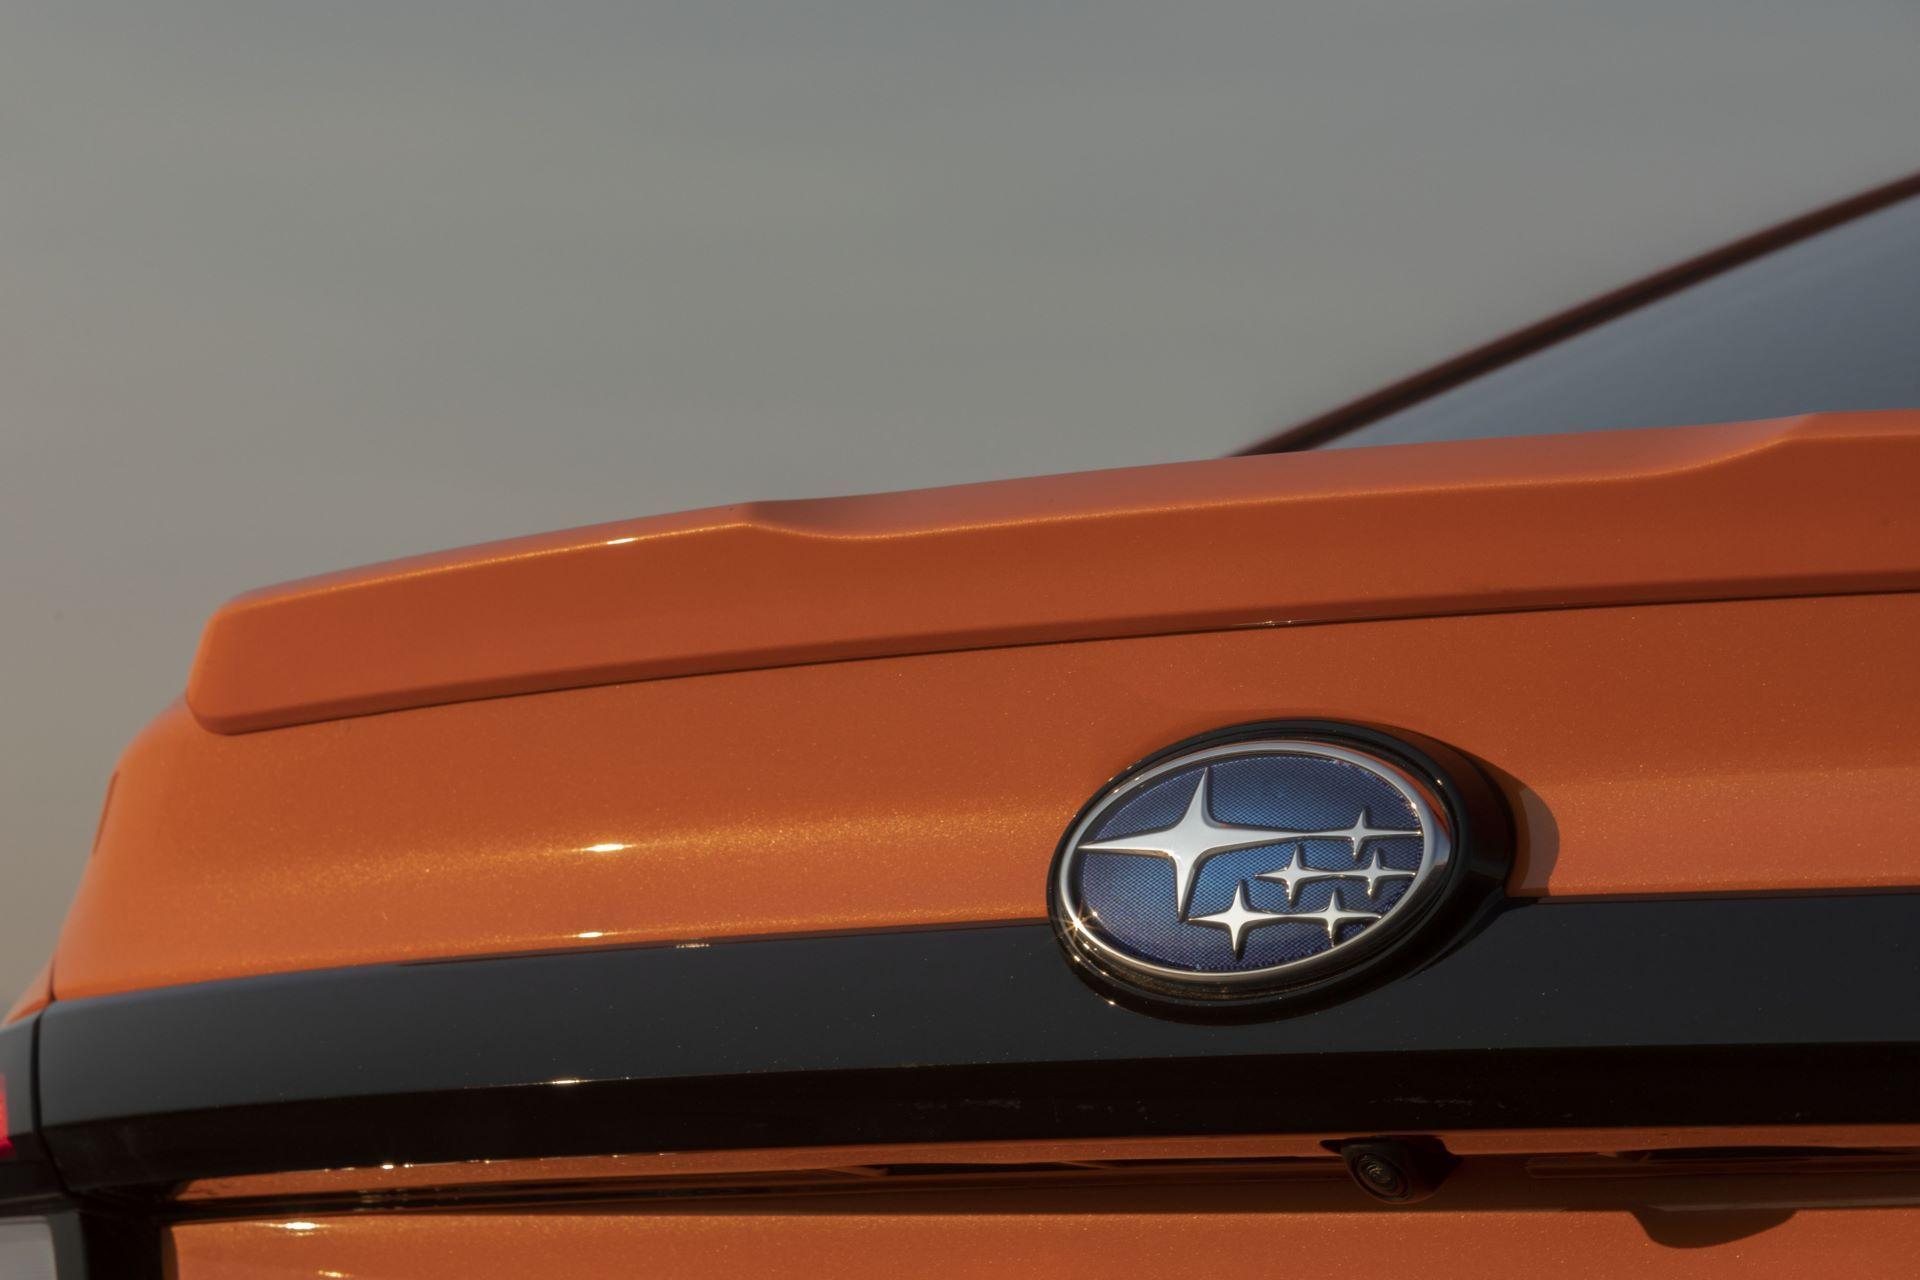 Subaru-WRX-2022-35